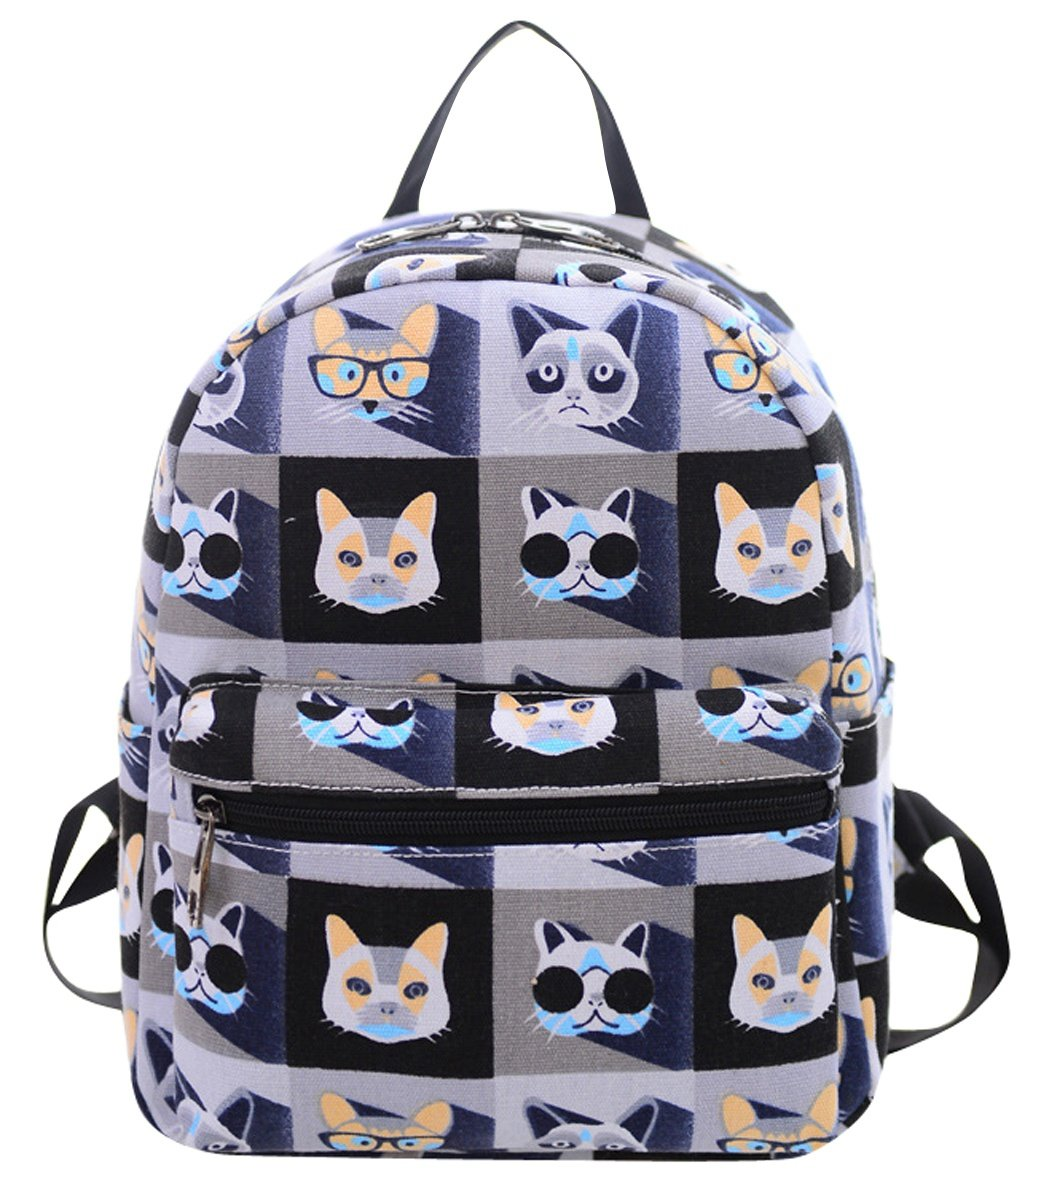 FEOYA Women's Canvas Backpack School Bag Fashion Book Bags Backpacks for Girls,Teens and Kids Cat Purple